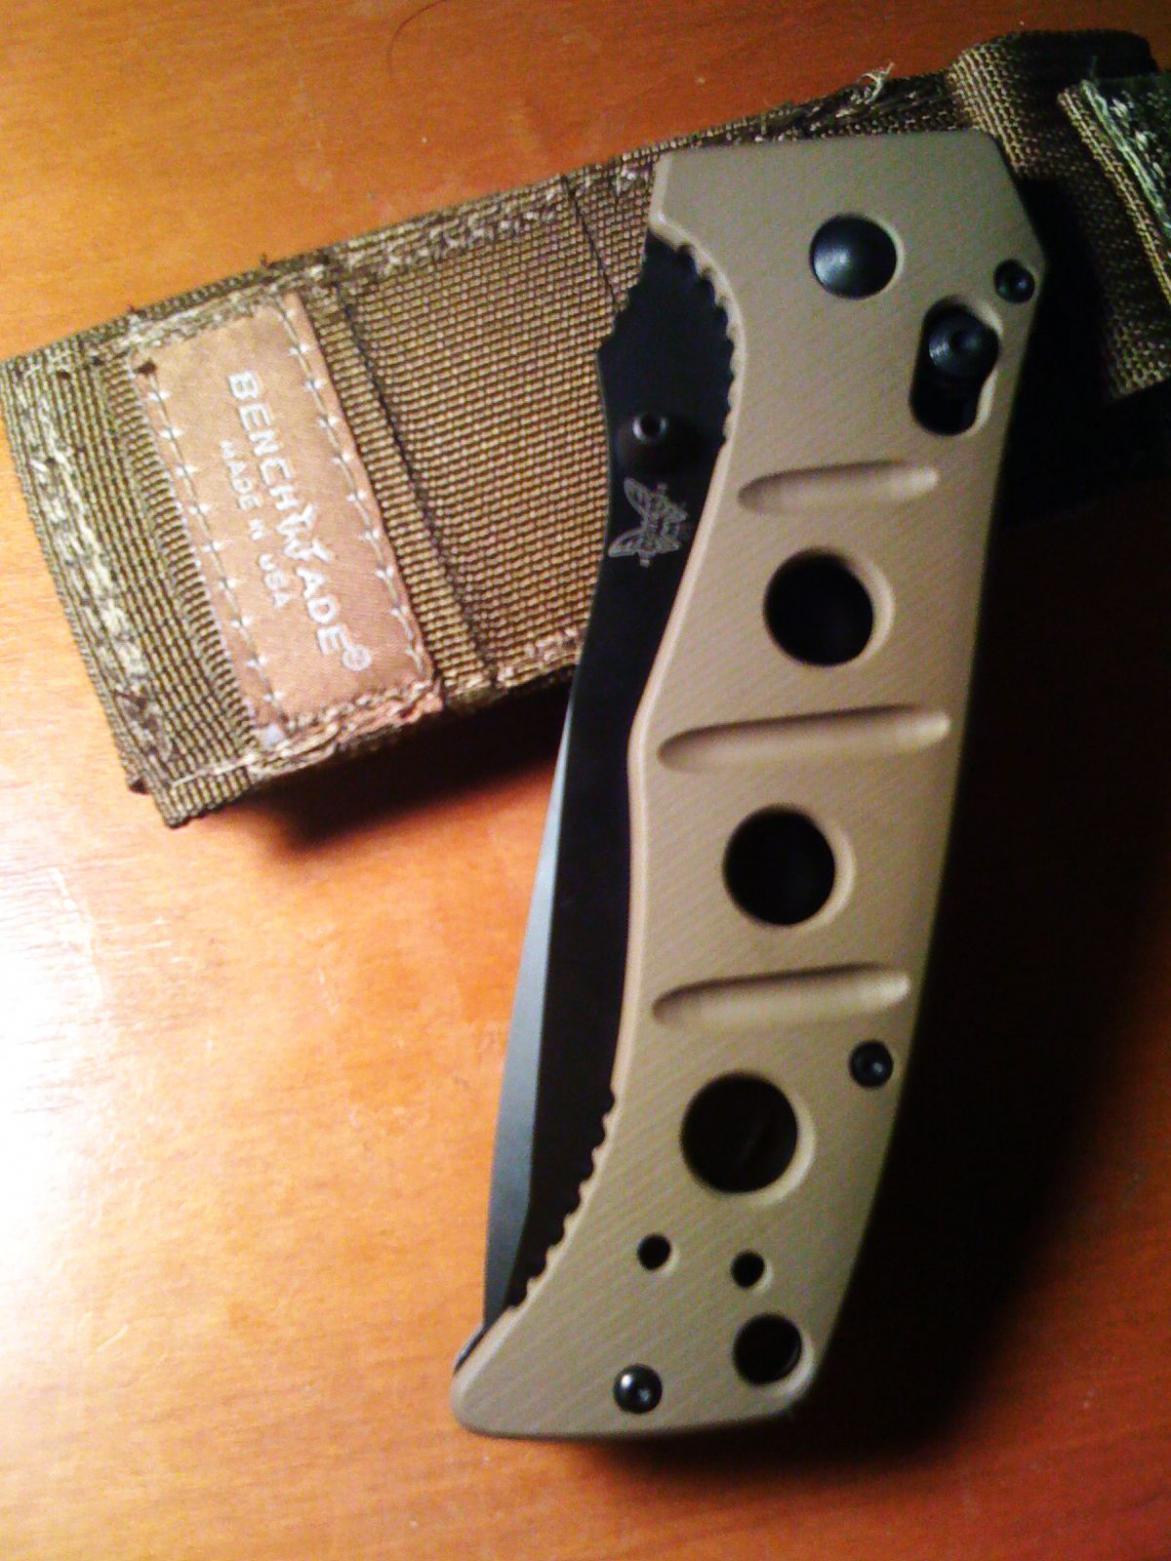 Benchmade Adamas 275 First Impressions | Springfield XD Forum